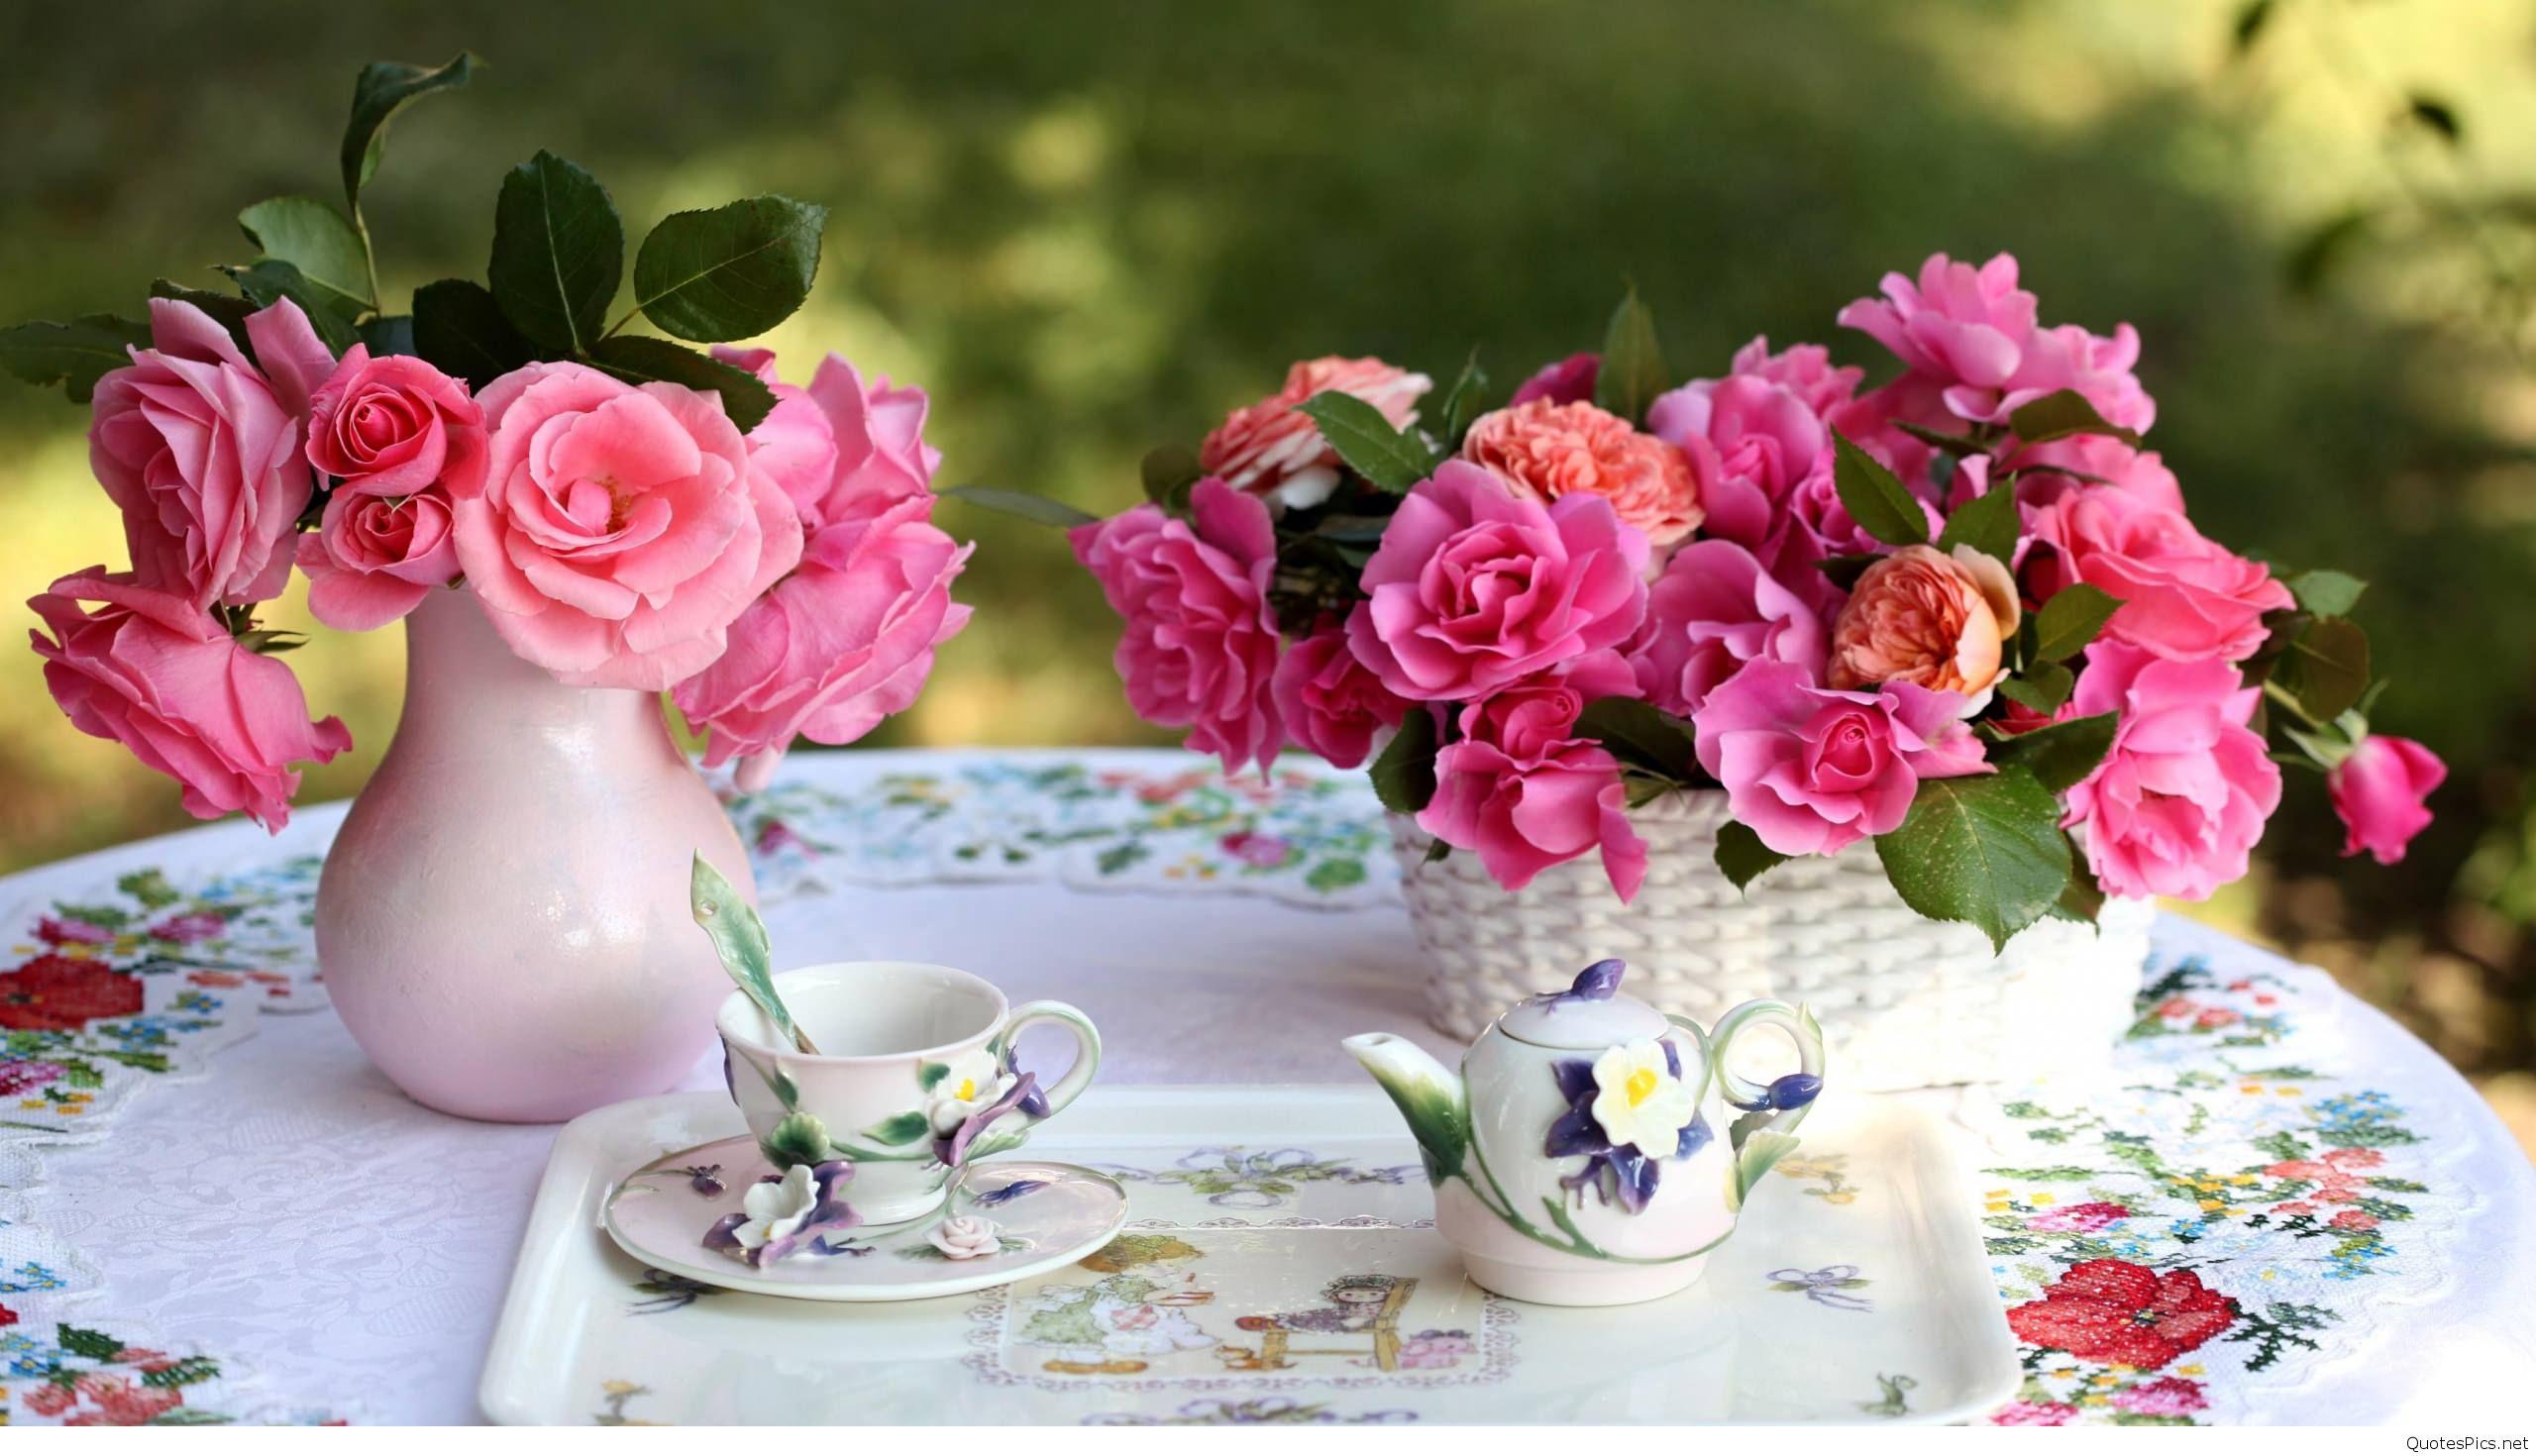 Good Morning Love Wallpaper Wallpaper Free Download 2560x1470